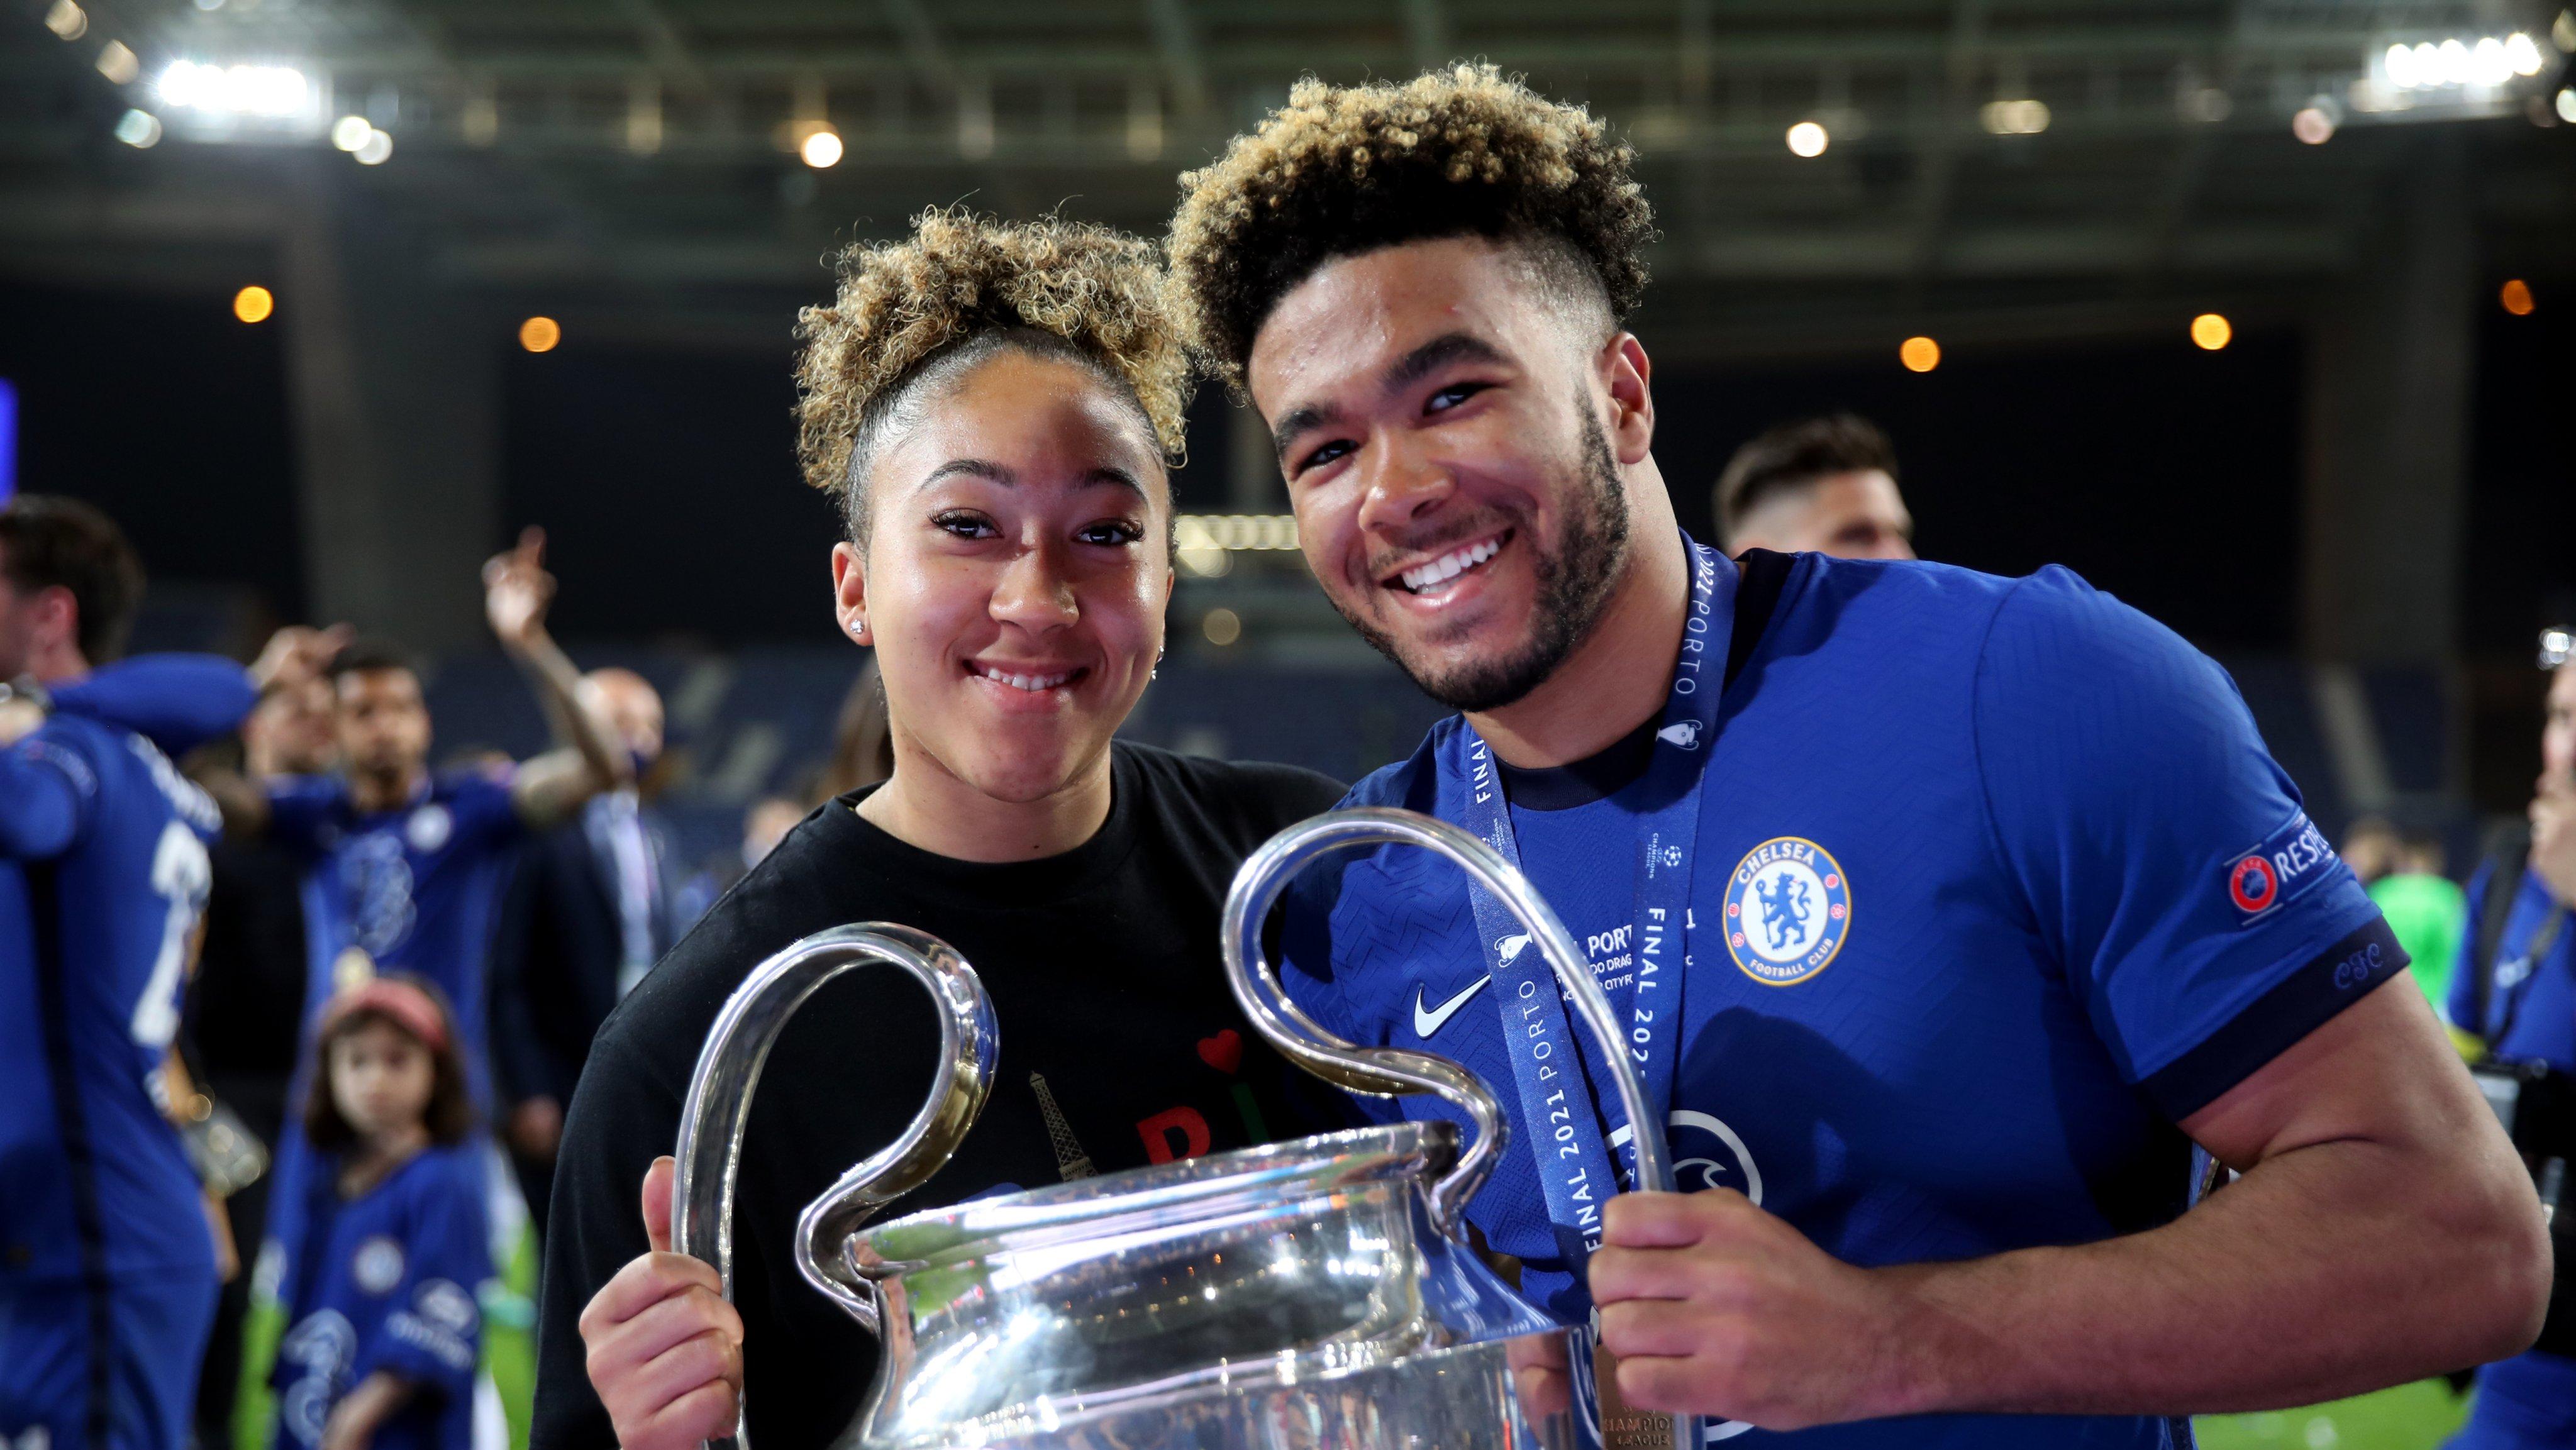 Manchester City v Chelsea - UEFA Champions League - Final - Estadio do Dragao